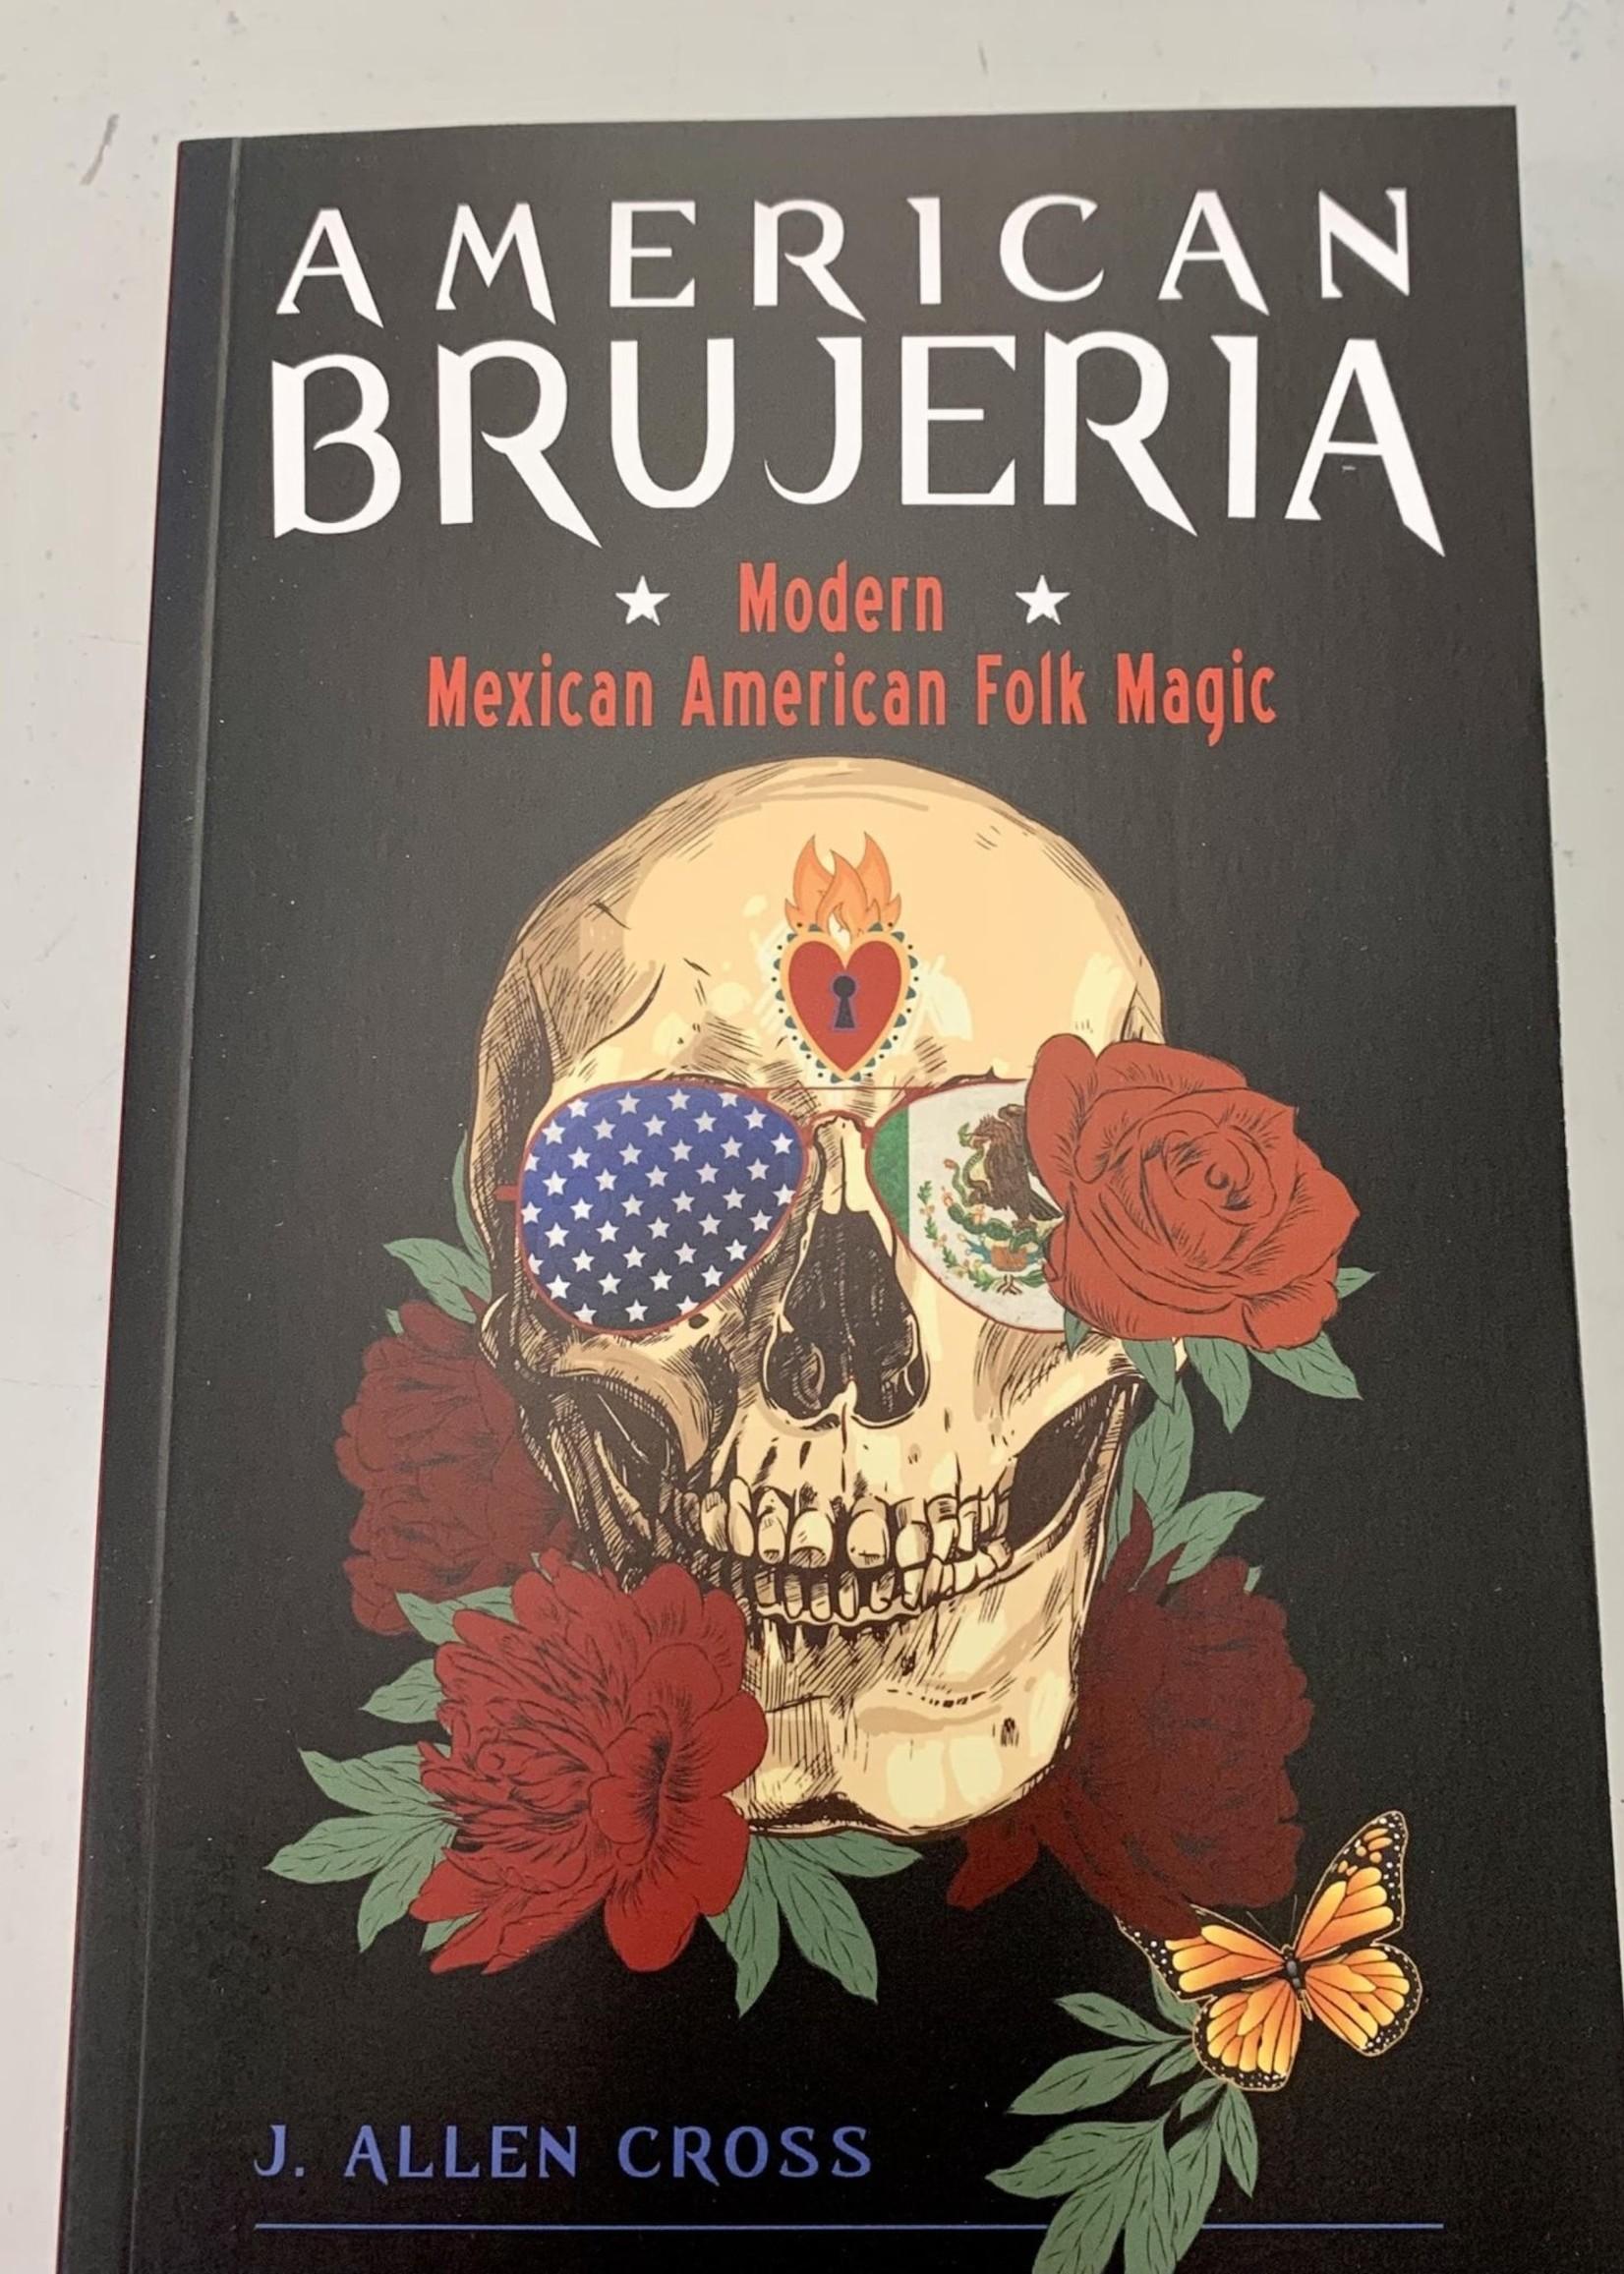 American Brujeria Modern Mexican American Folk Magic - Author J. Allen Cross